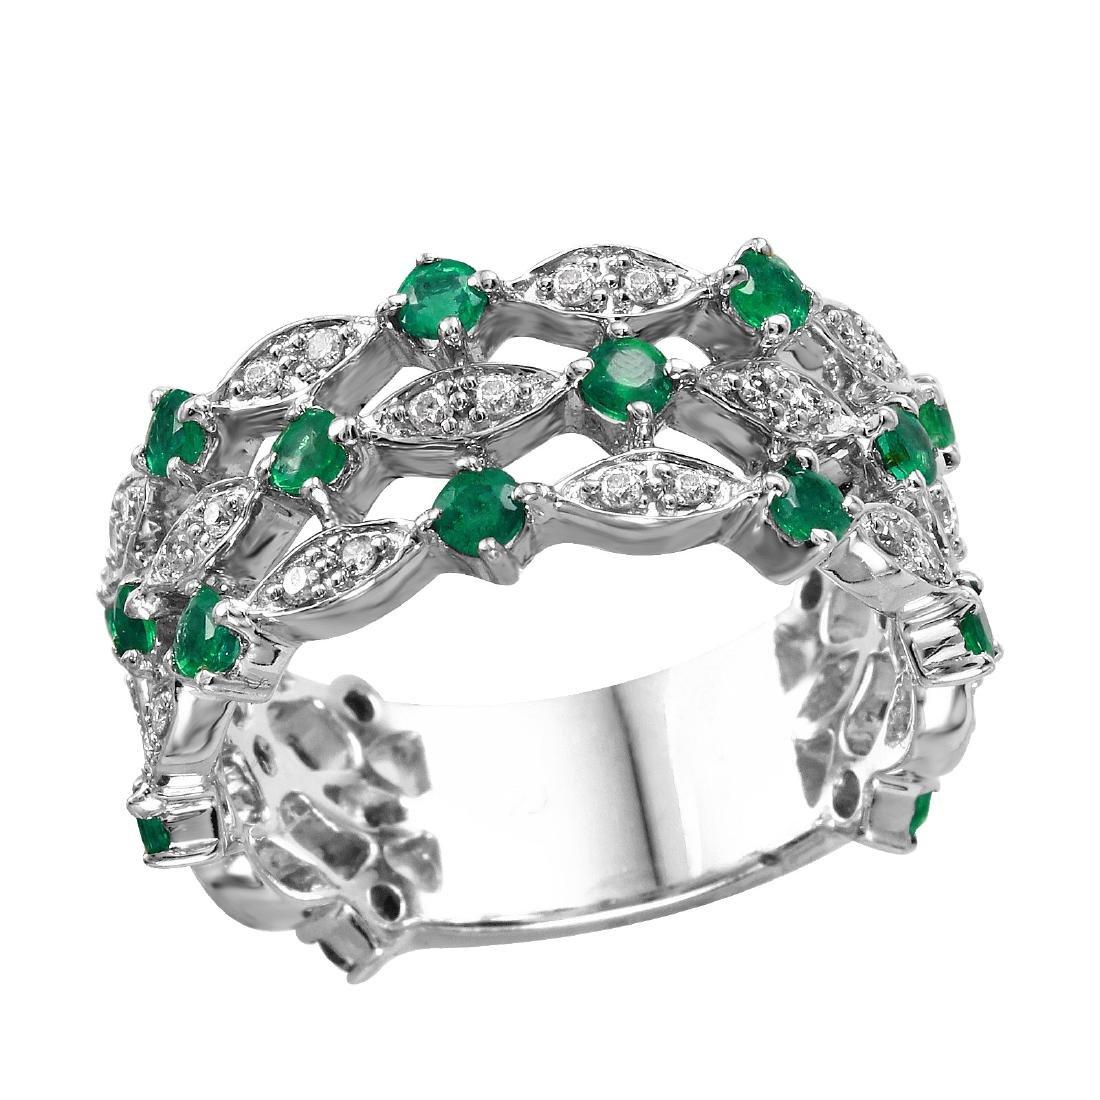 14KT White Gold 1.25ctw Emerald Diamond Ring Size 6.25 - 4